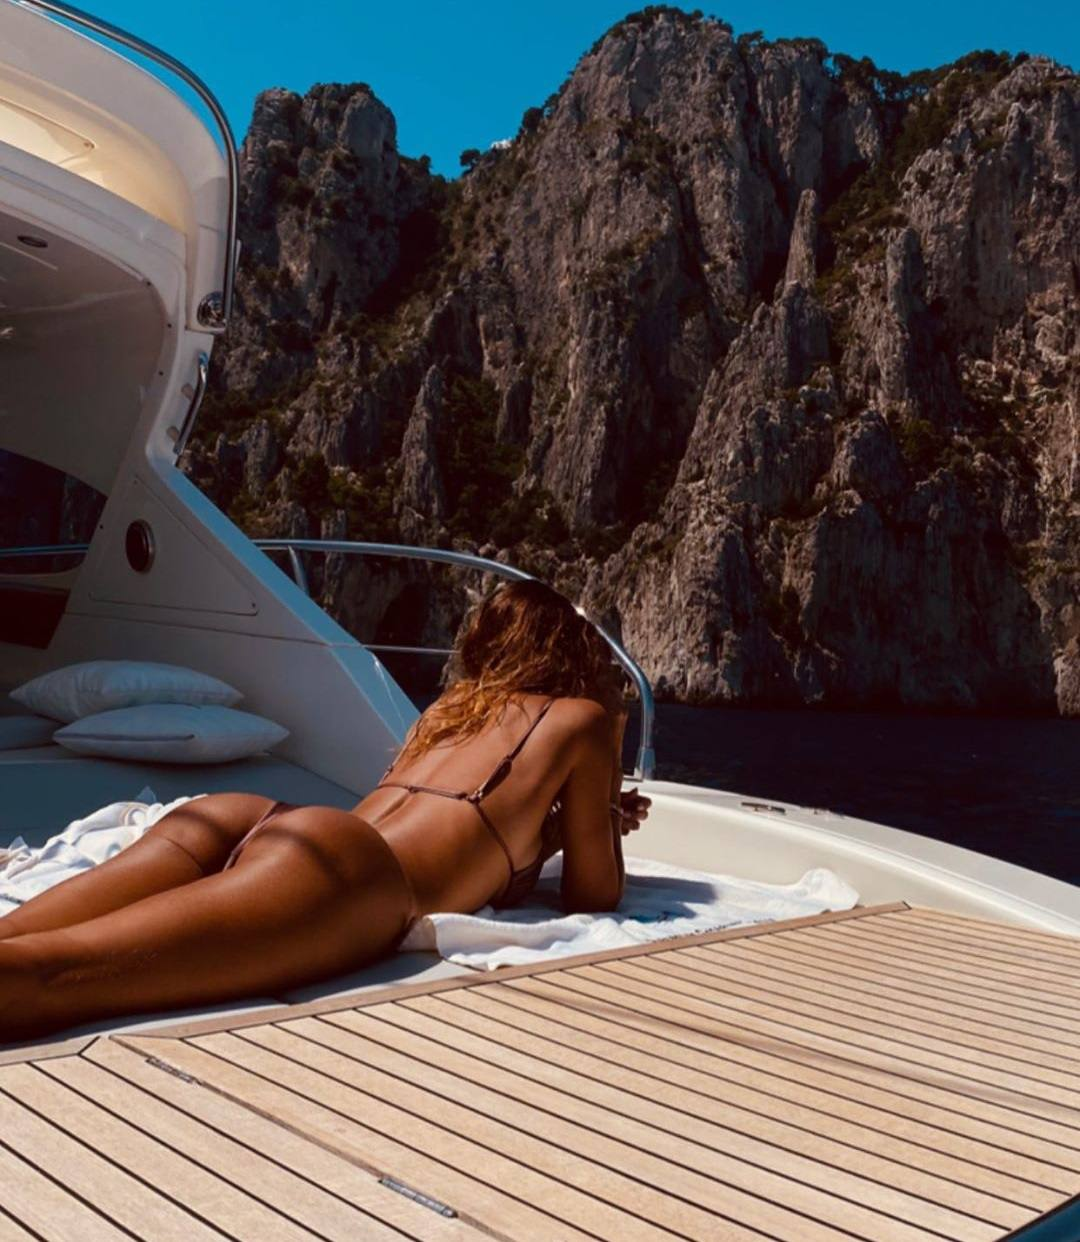 Belen Rodriguez Beautiful Ass In Thog